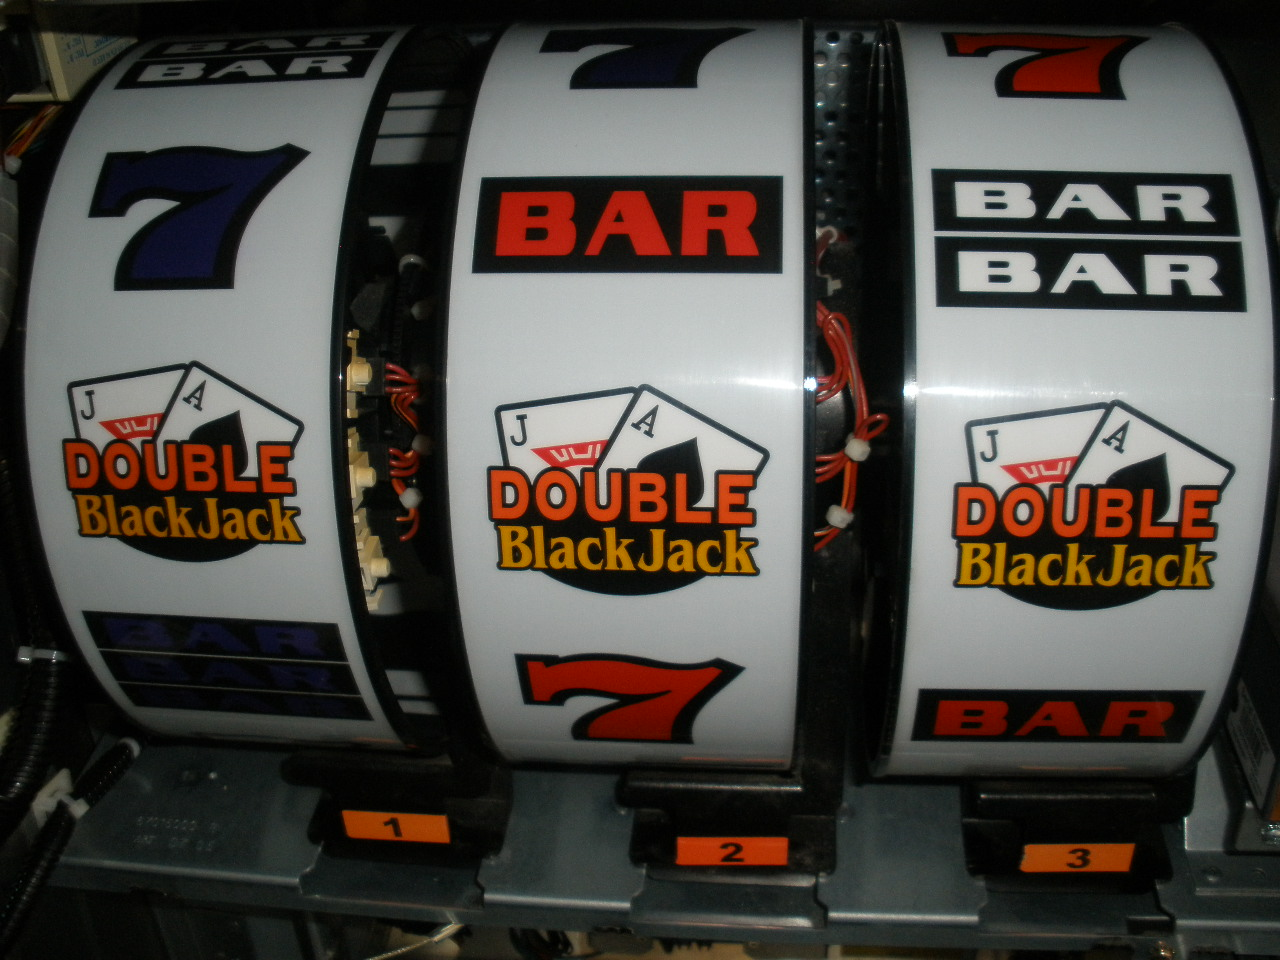 Blackjack Machine For Sale